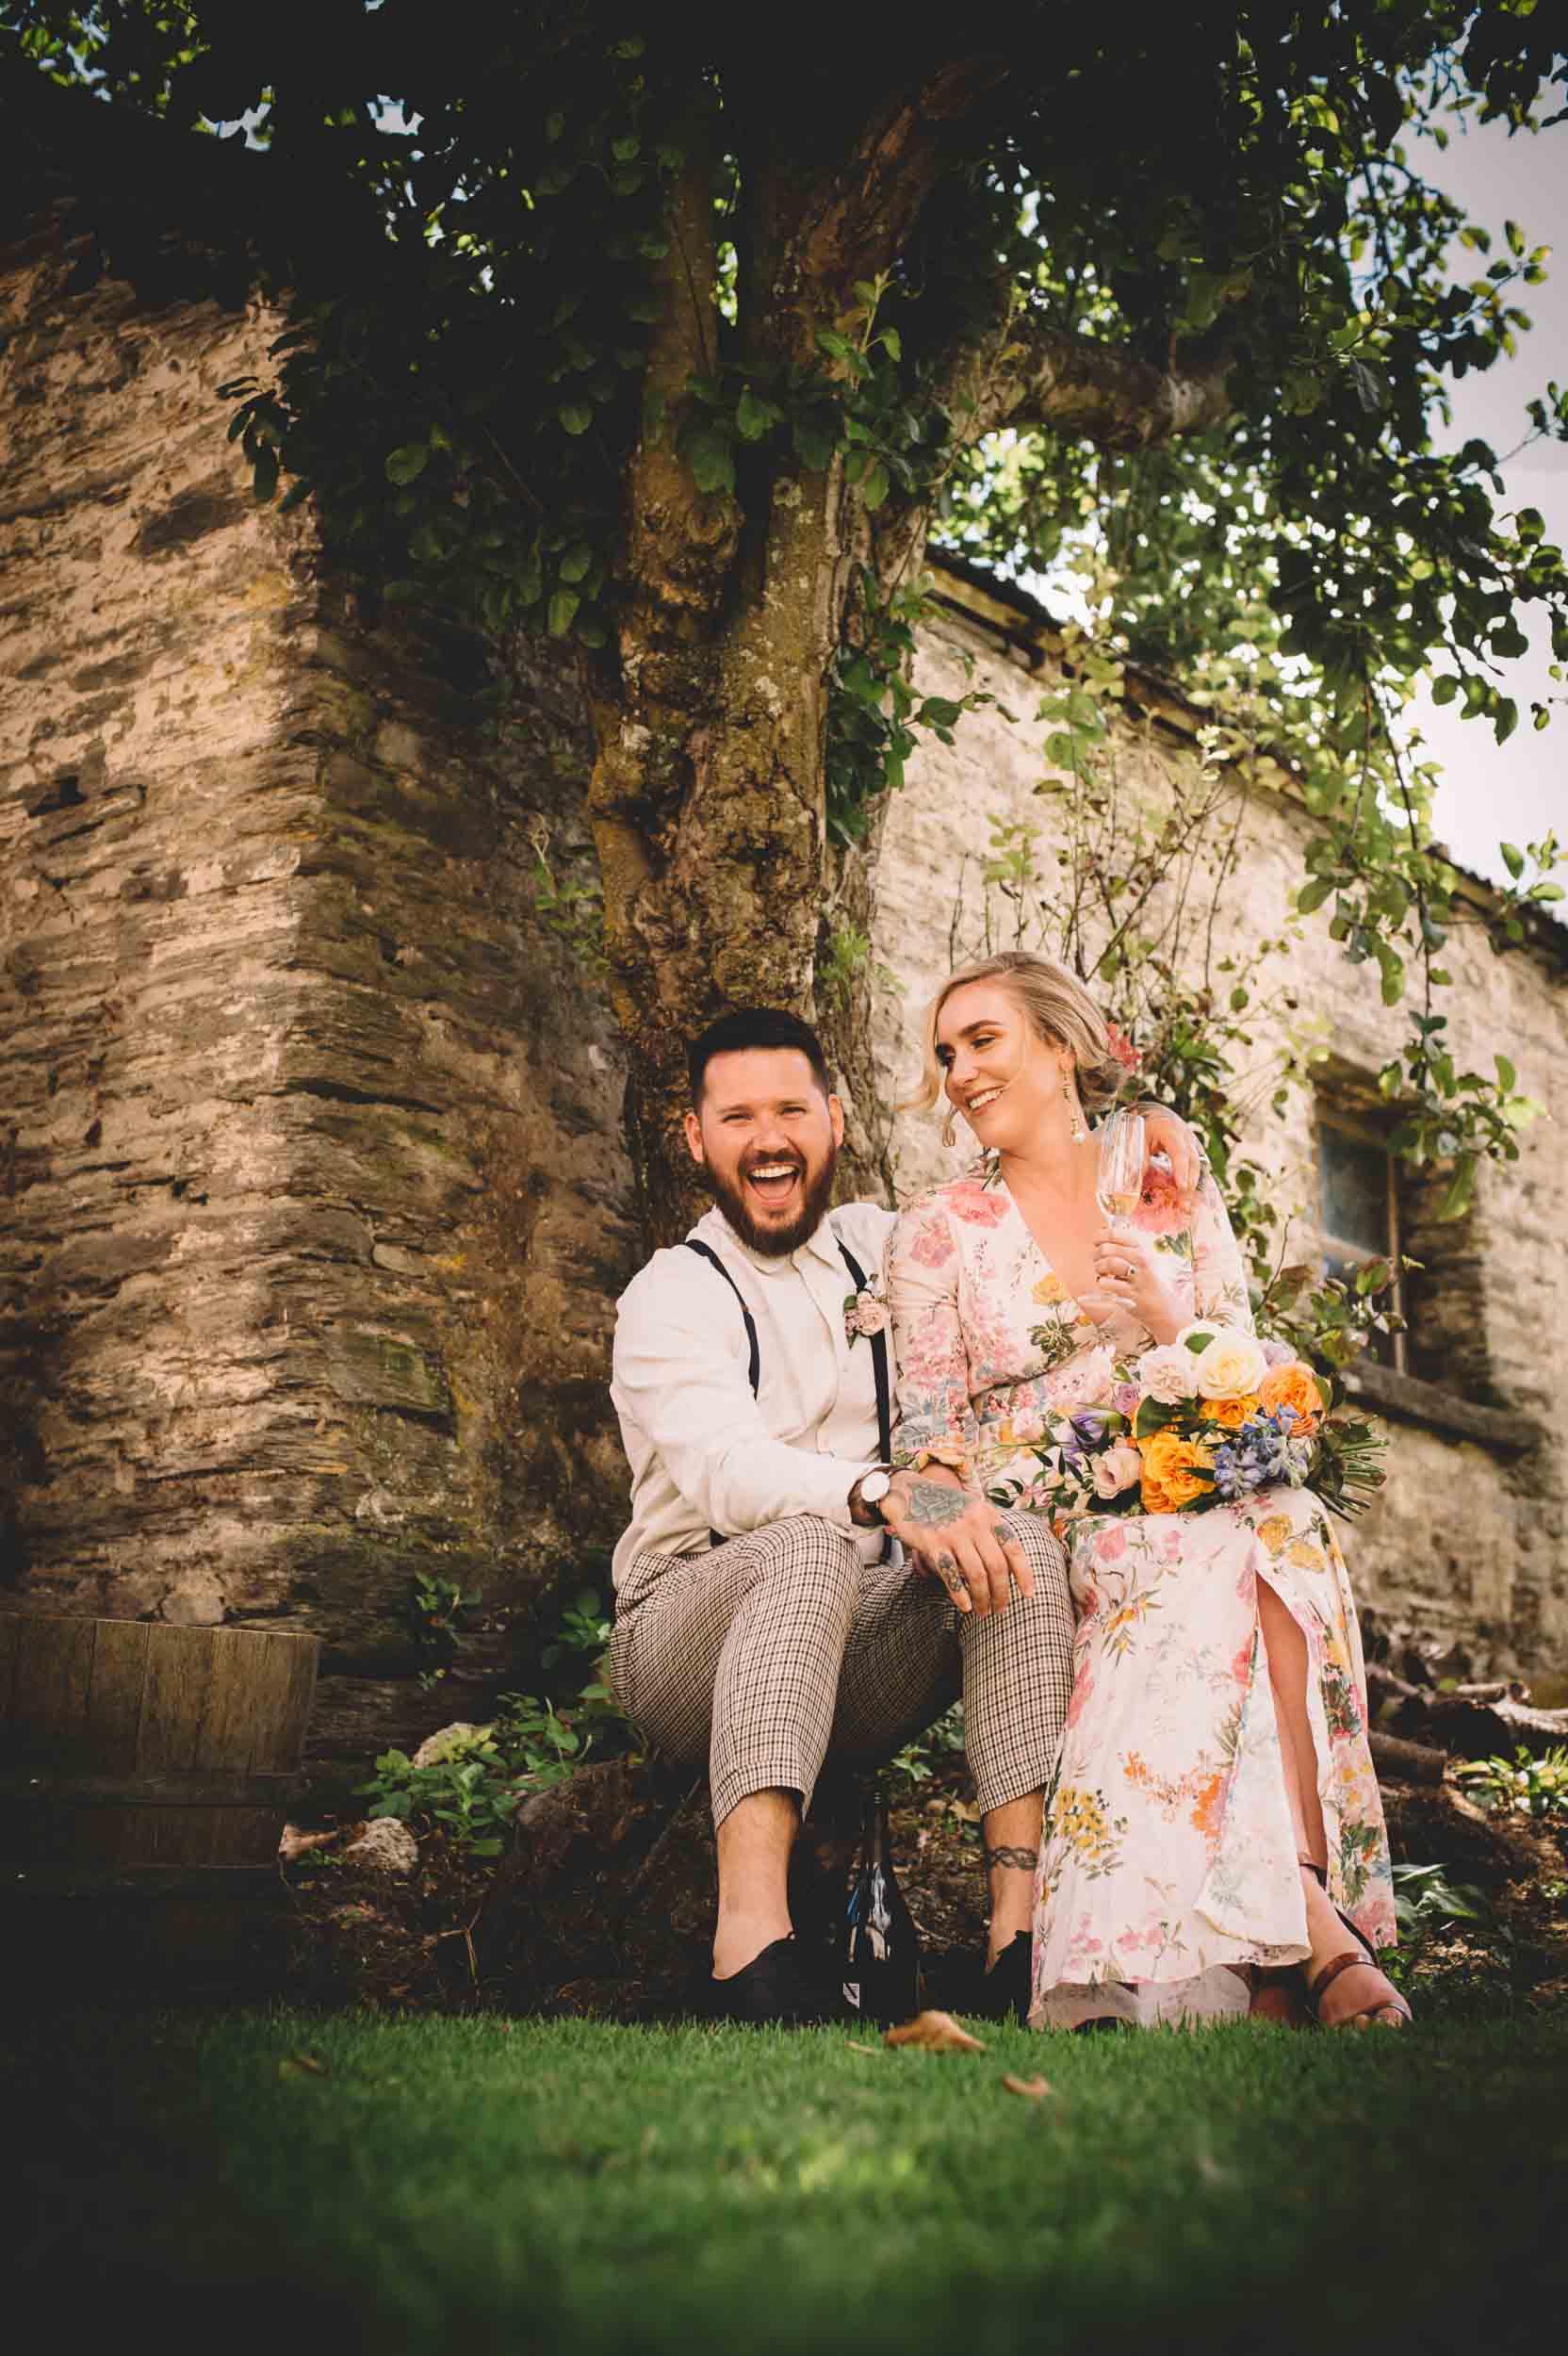 Nick & Nina's Thurlby Domain Elopement old stone building bride & groom photos